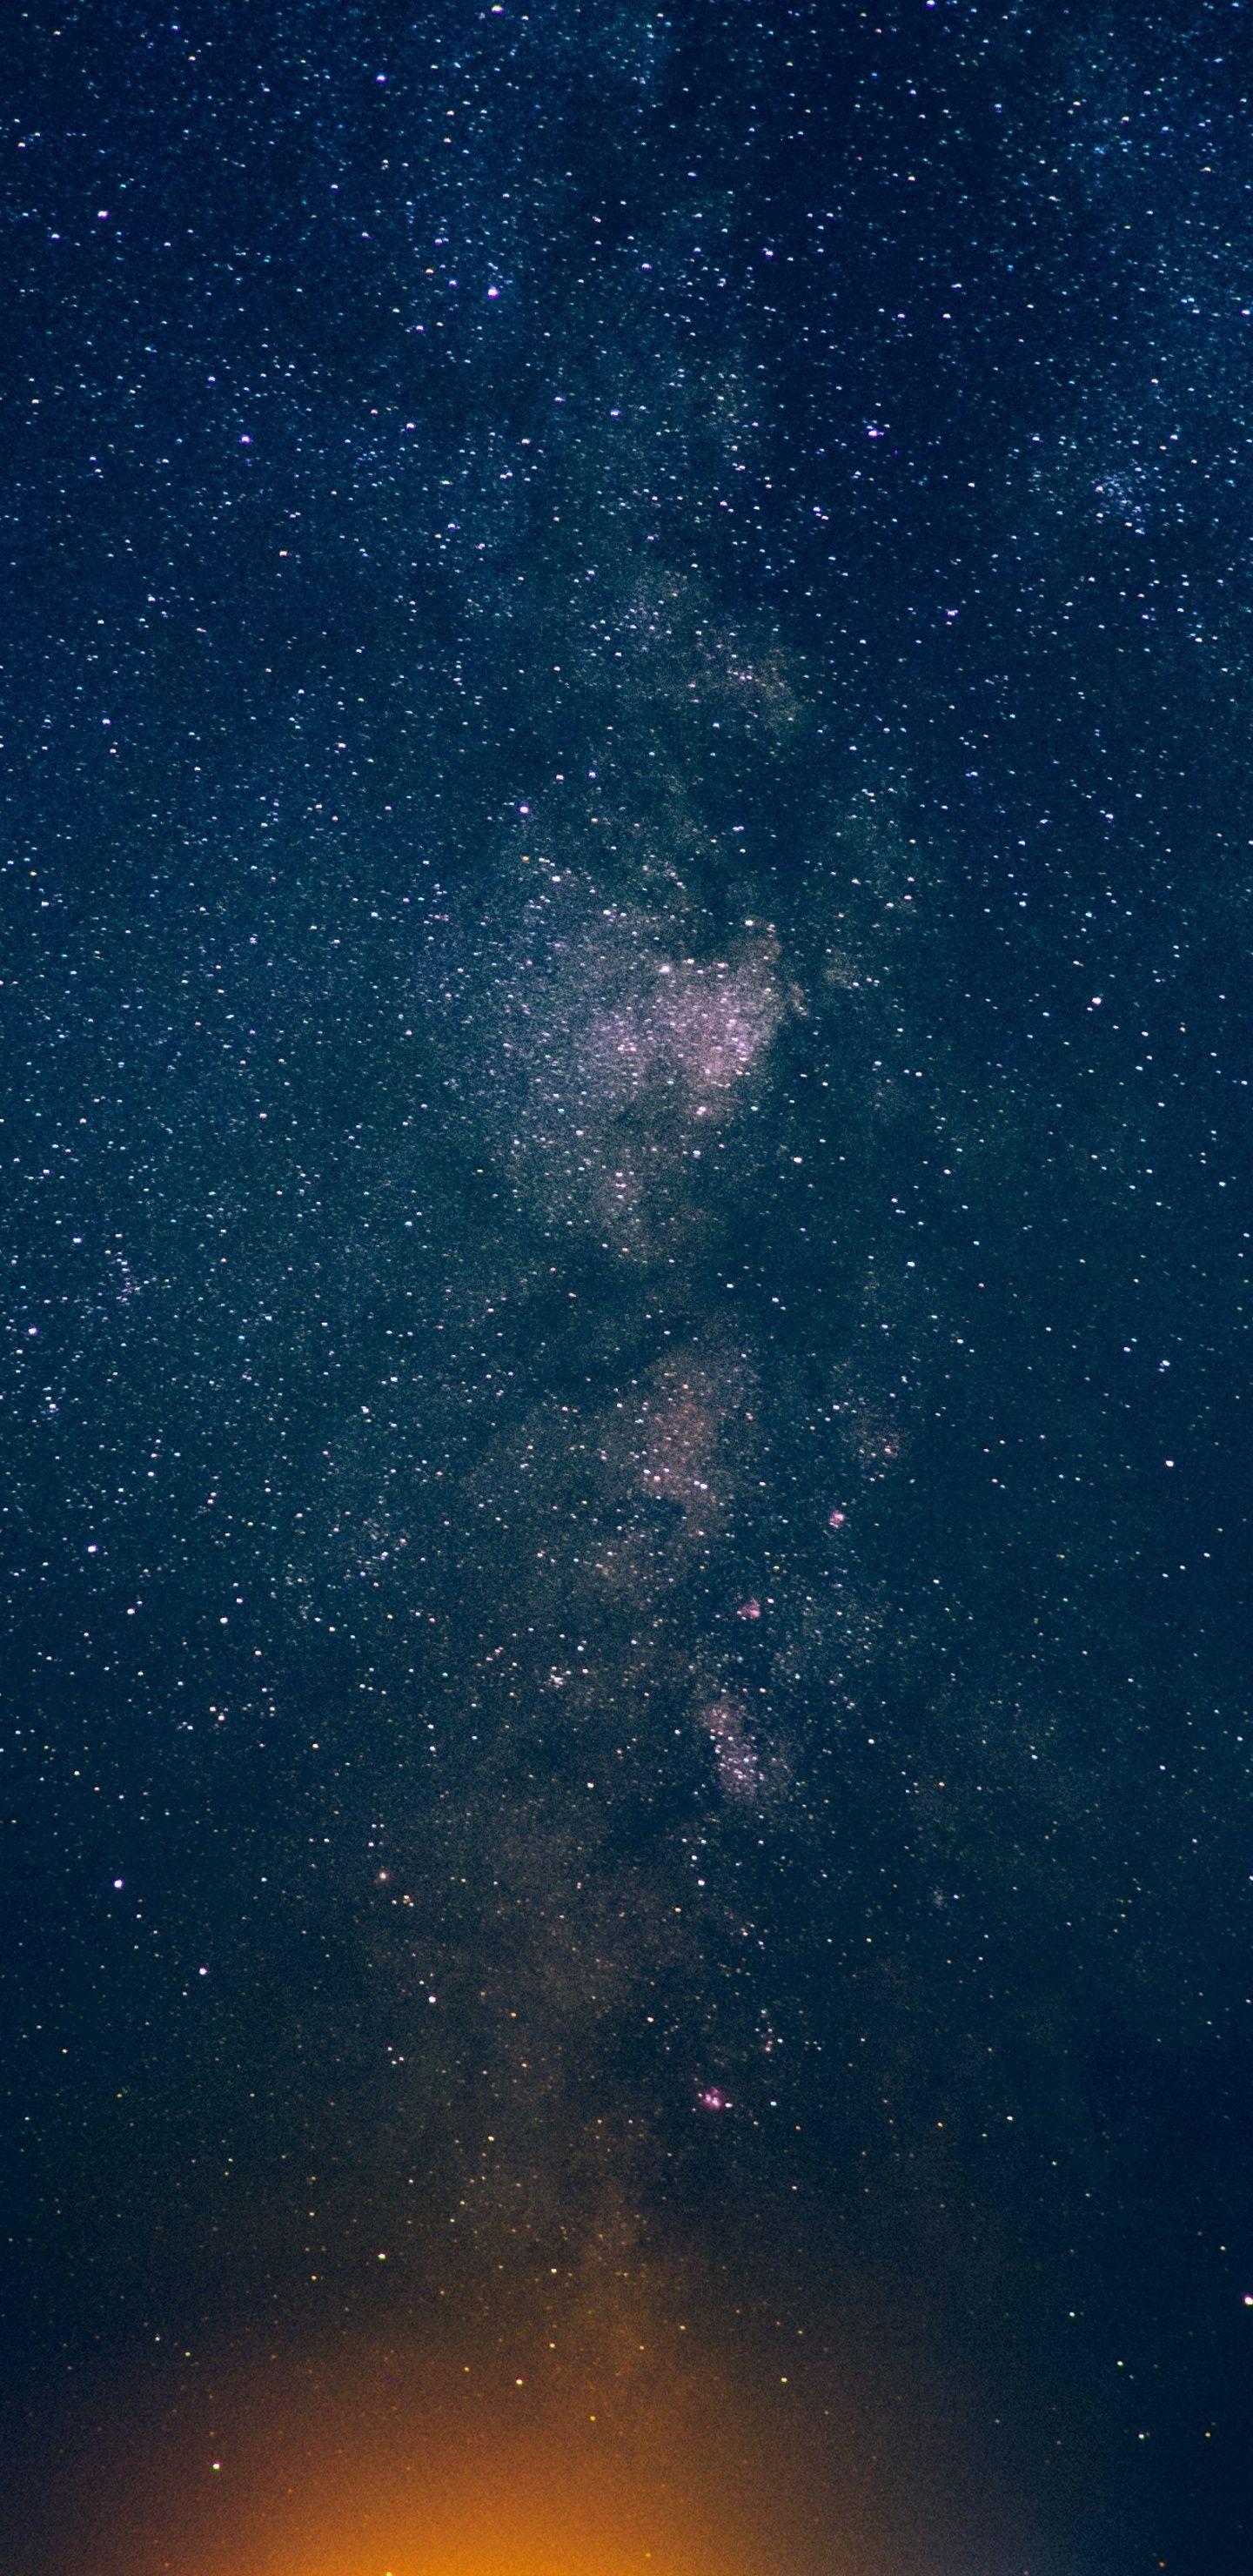 Samsung Galaxy S8 4k Wallpapers Los Mejores Fondos De Pantalla Gratis Para Samsung Galaxy S8 4k Wallpaperaccess In 2020 Starry Sky Milky Way Wallpaper